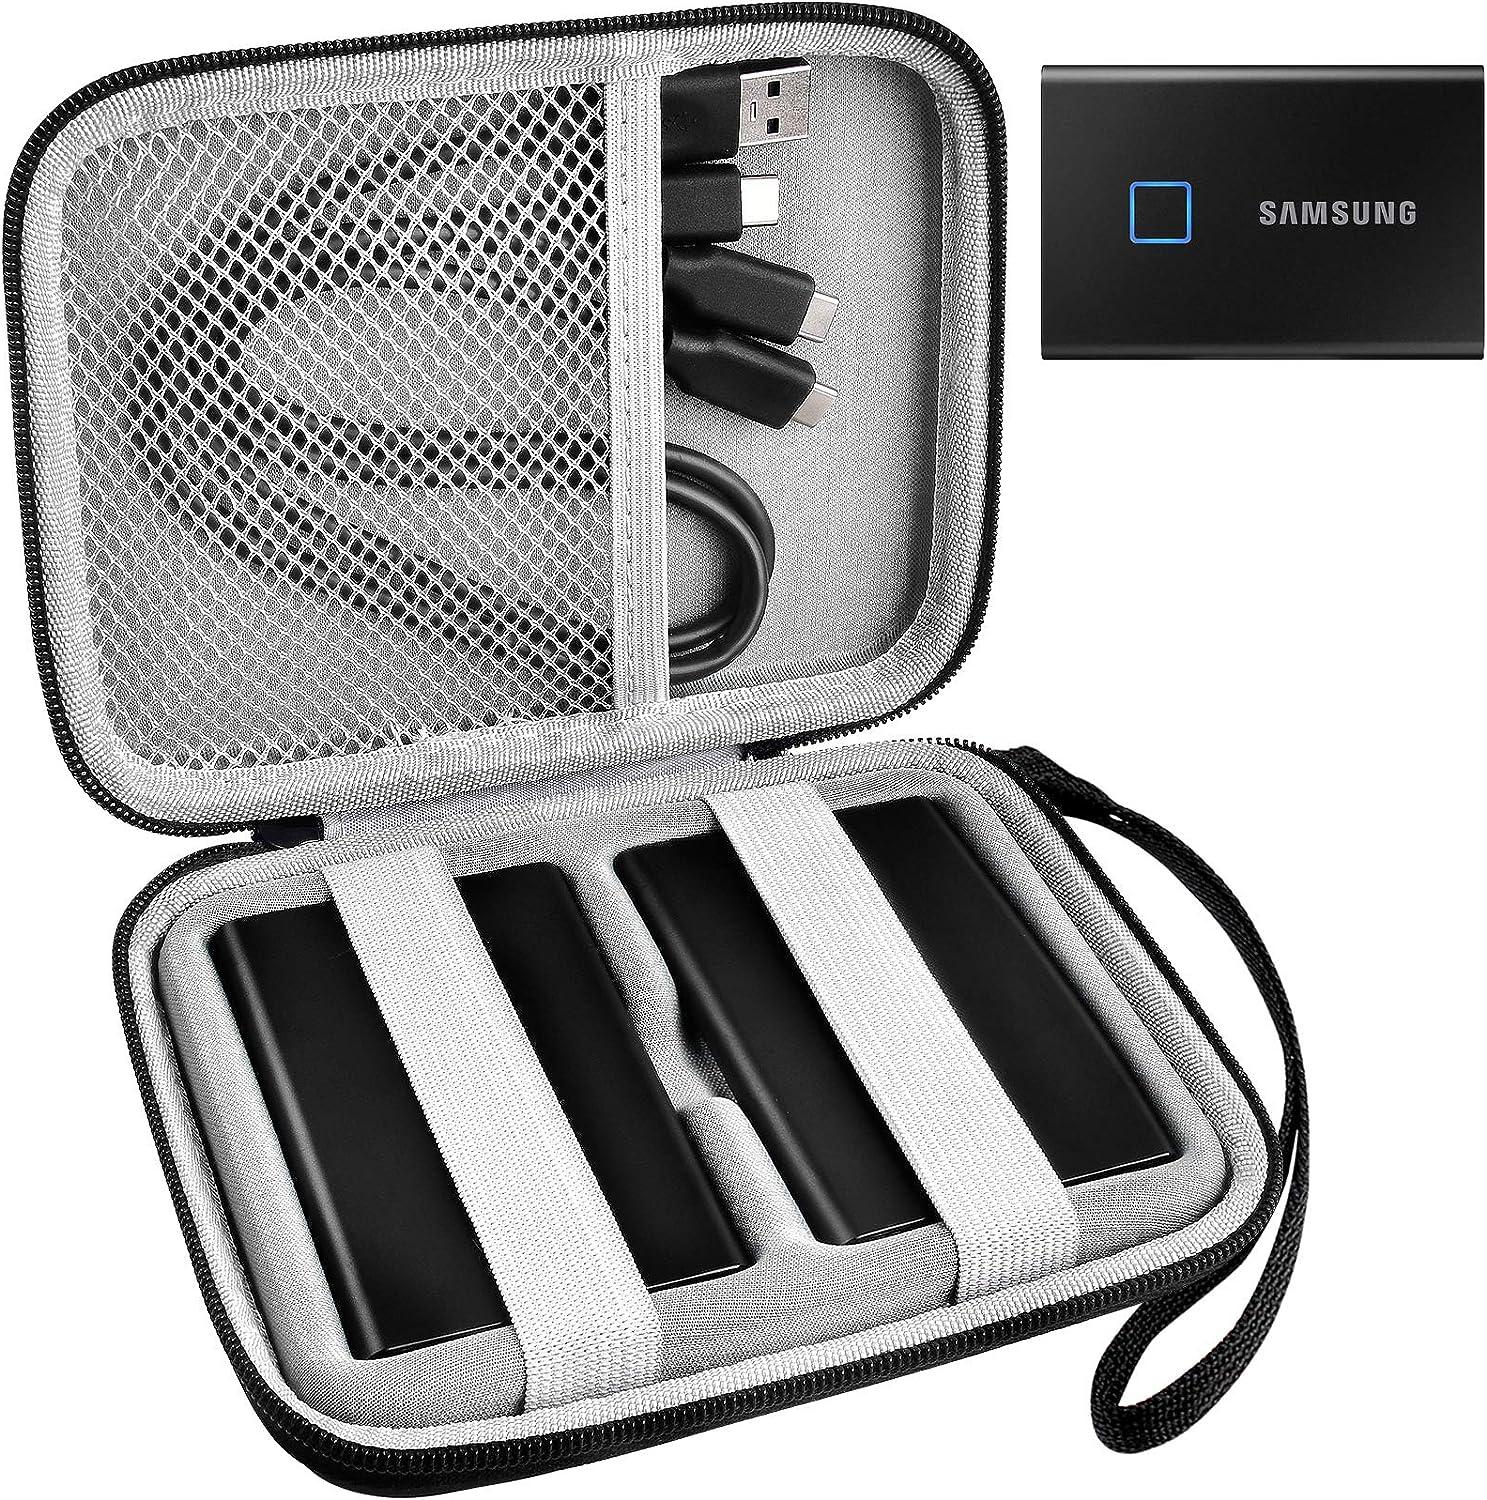 Schutzhülle Kompatibel Mit Samsung T7 Touch T7 Portable Ssd 1 Tb 2 Tb 500 Gb Usb 3 2 Externe Solid State Drive Reisebox Für 2 Samsung Ssd Und Kabel Elektronik